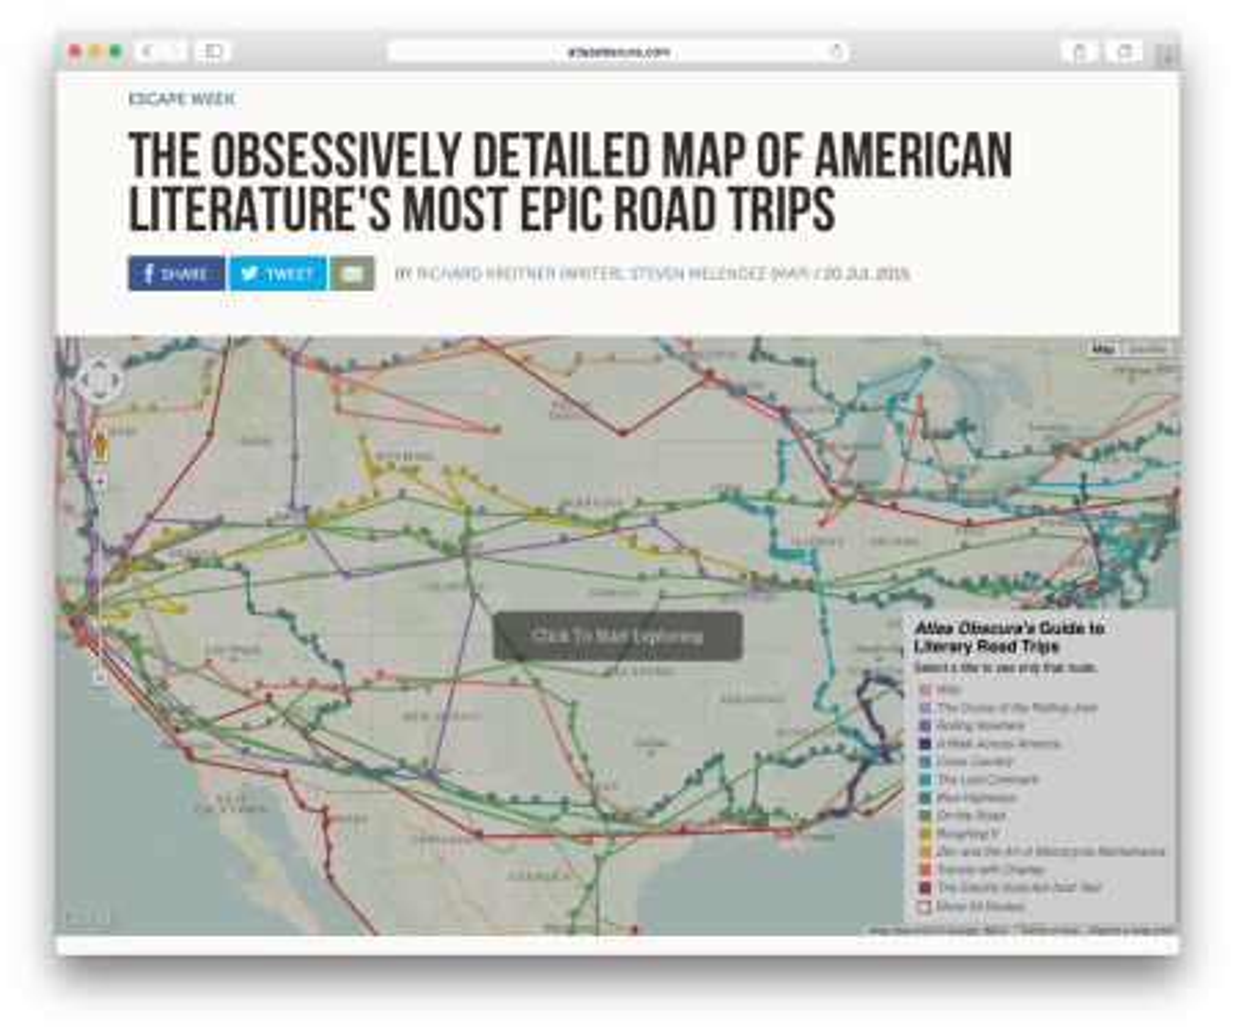 Atlas Obscura road trip map